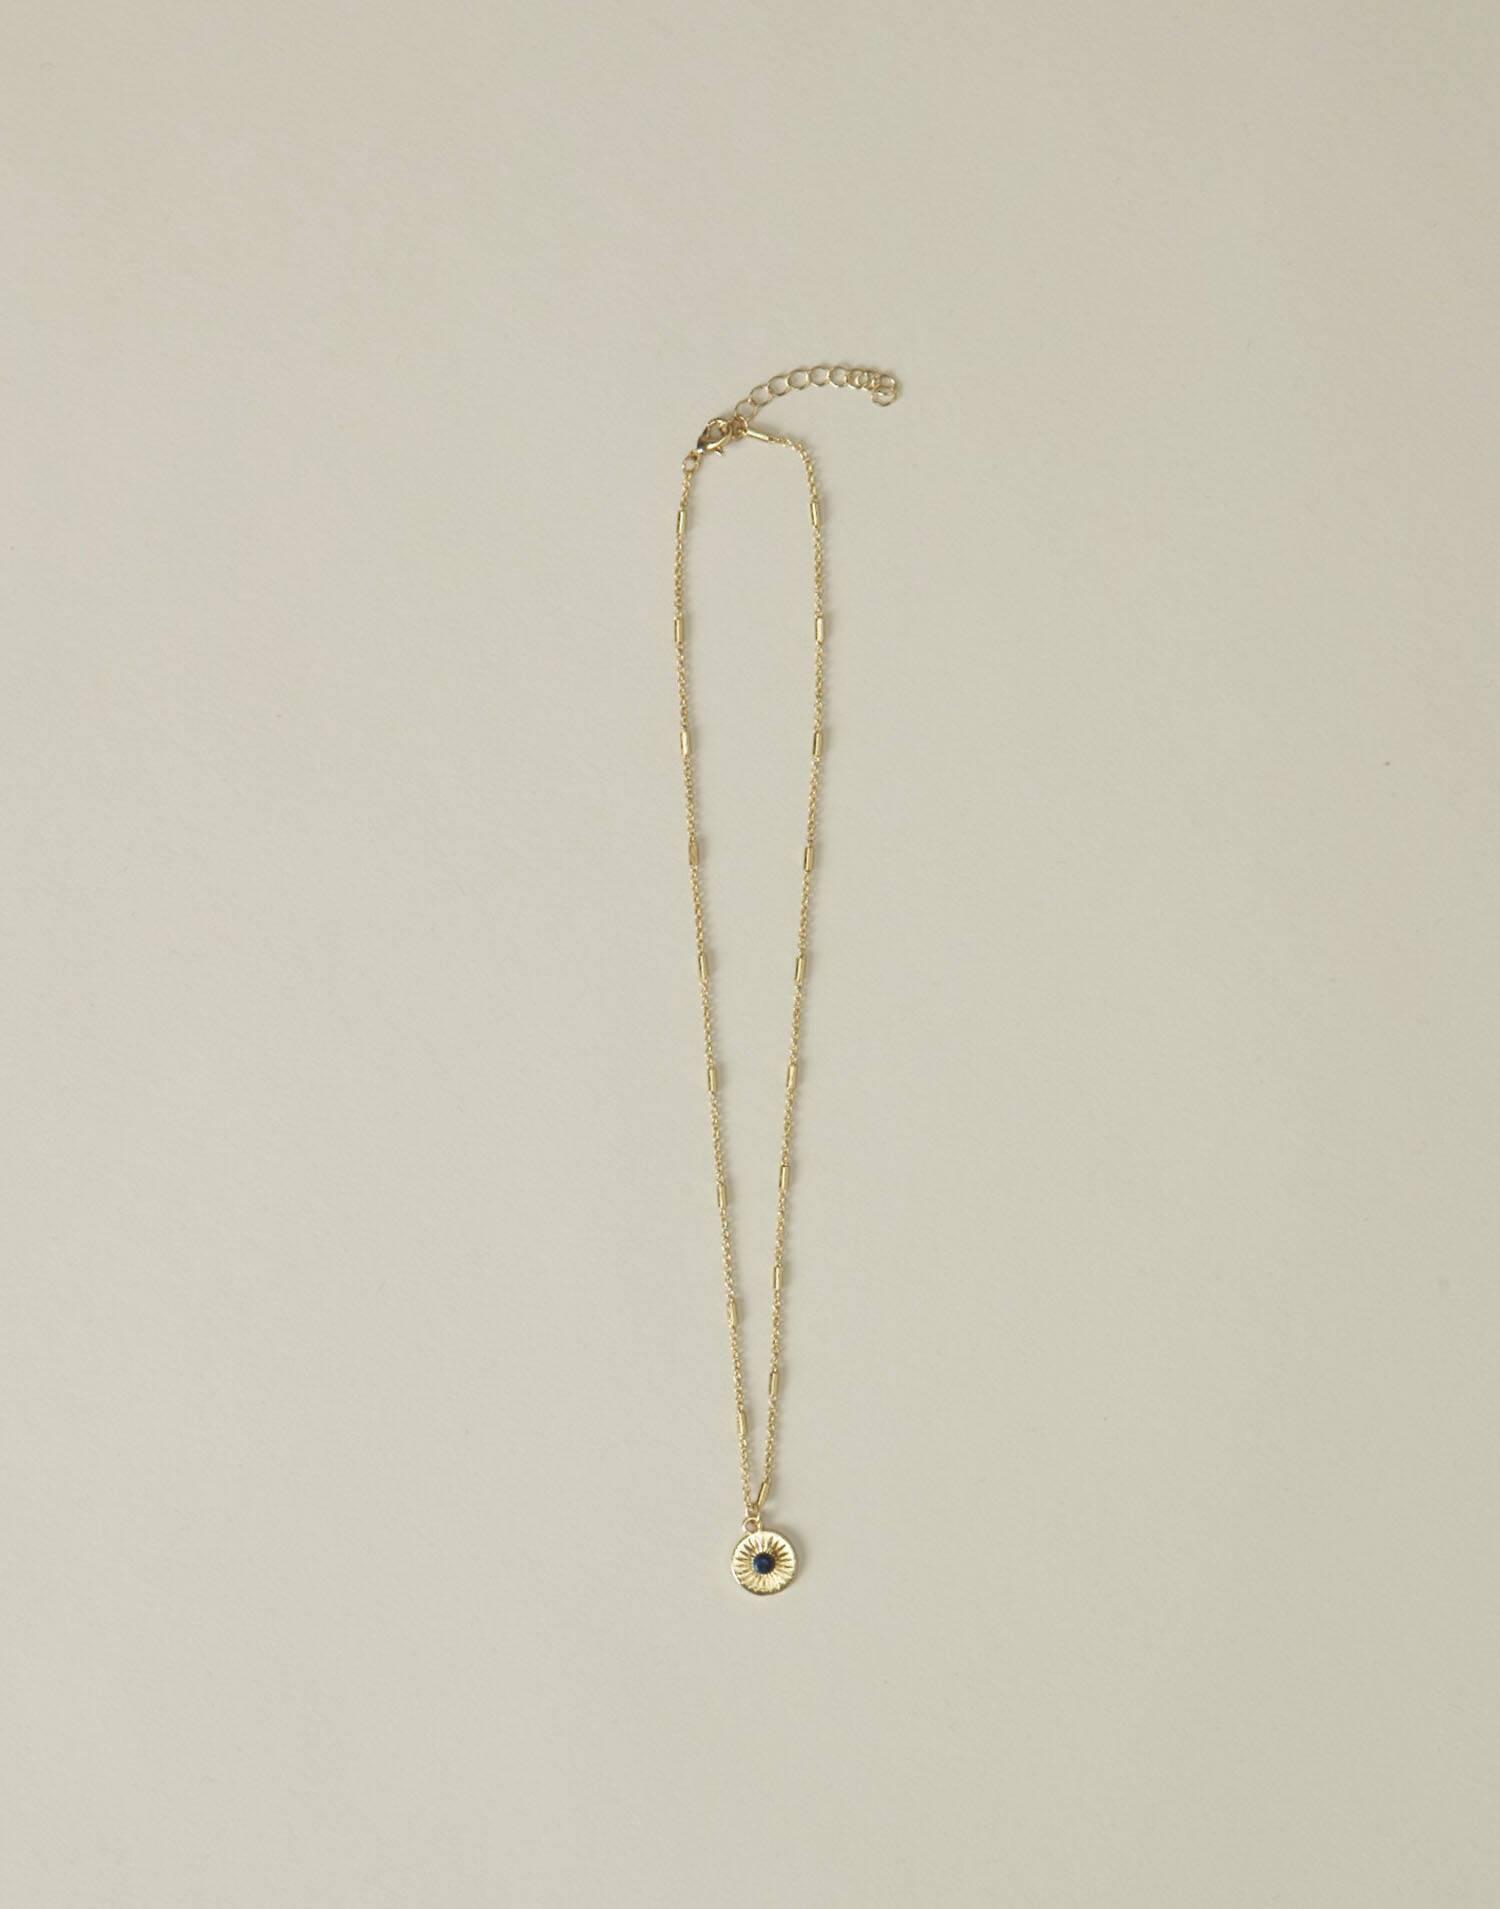 Collar cadena medalla redonda